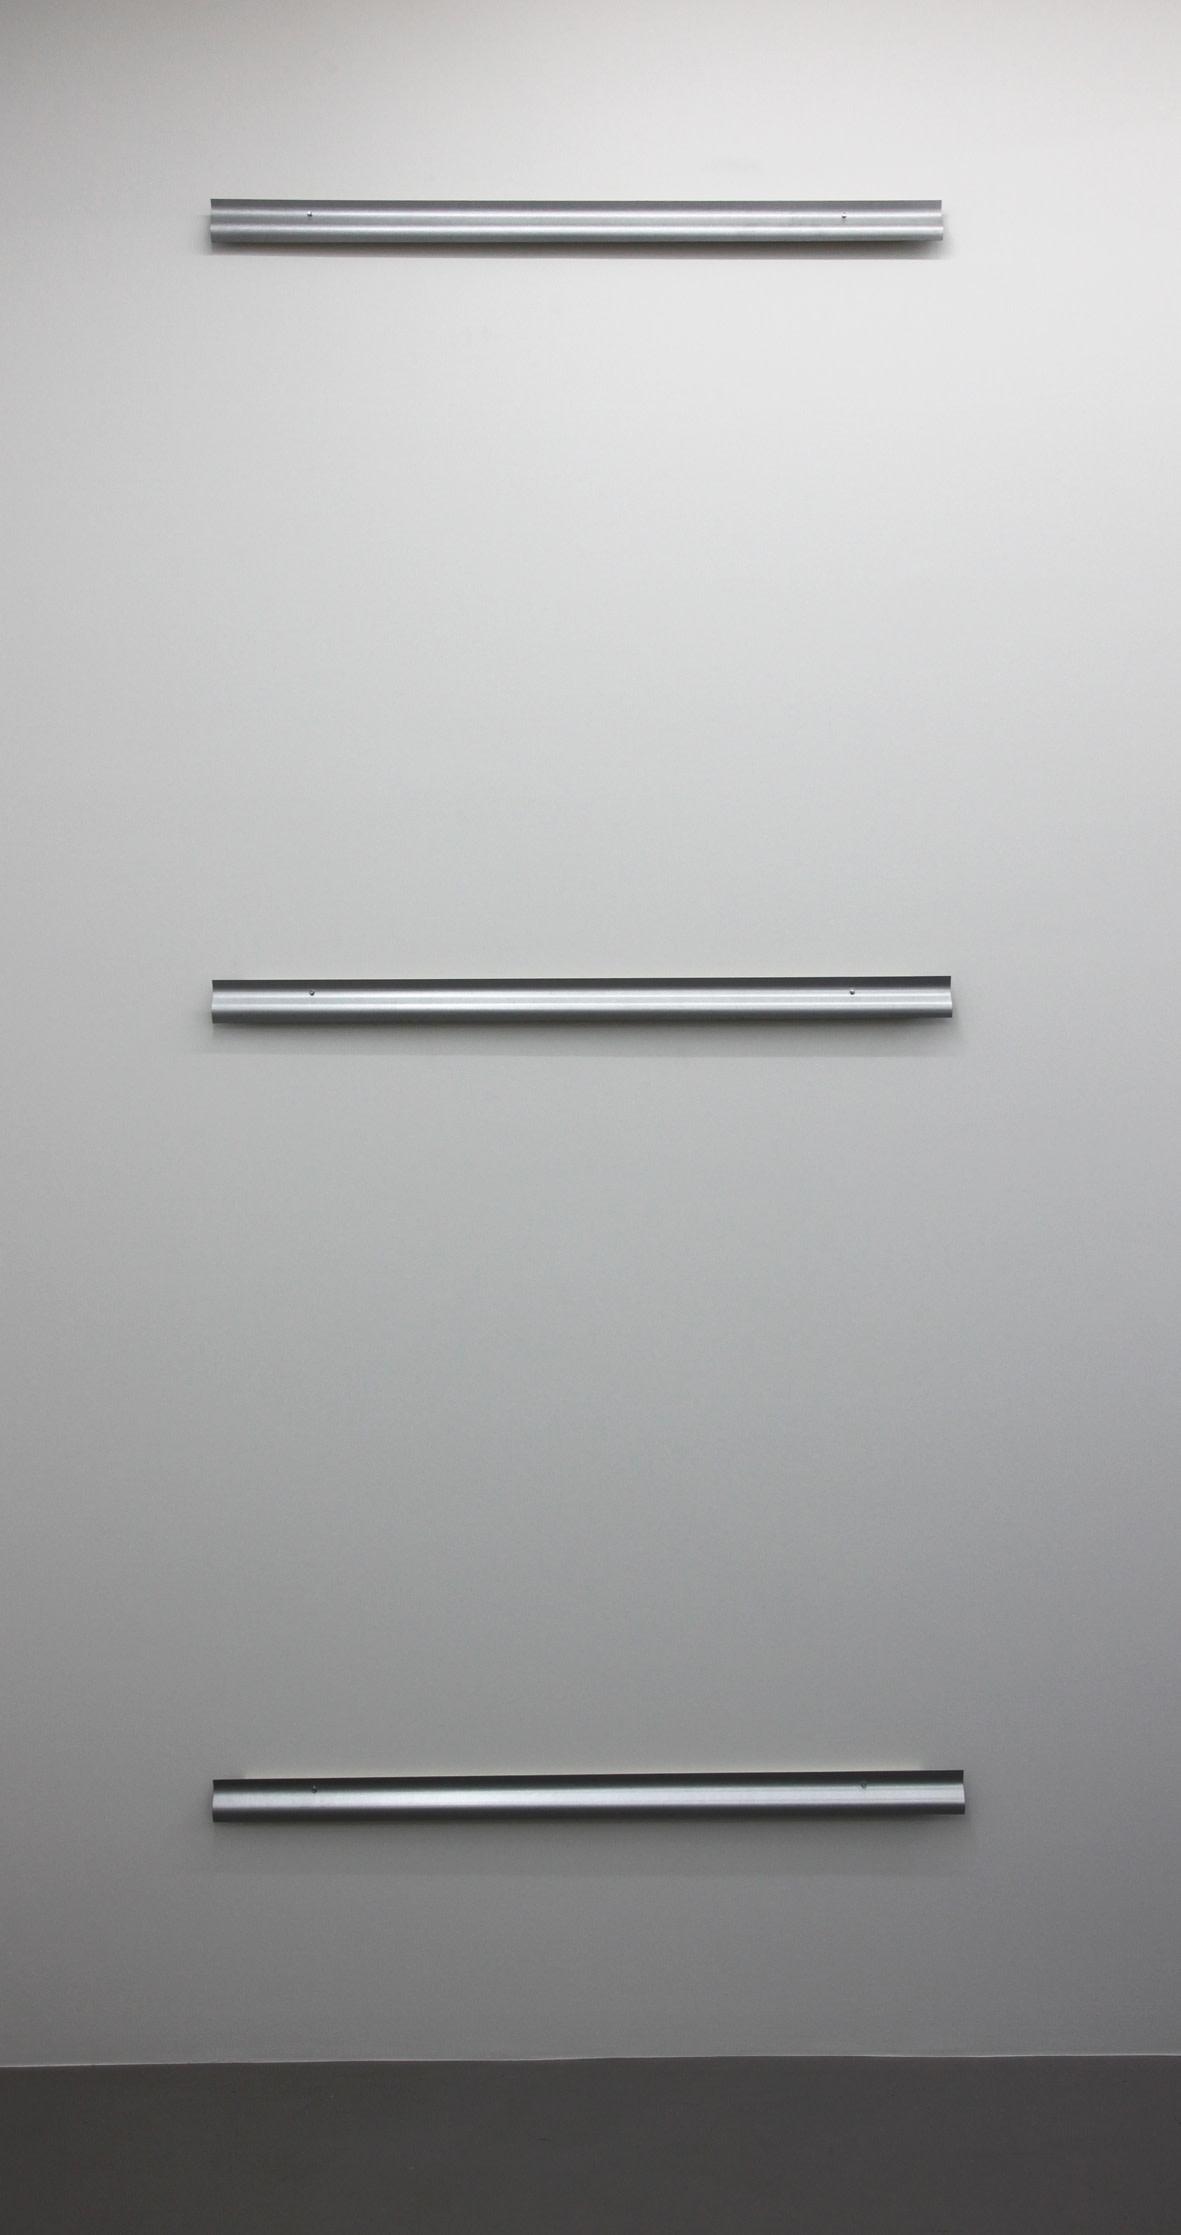 "<span class=""link fancybox-details-link""><a href=""/exhibitions/117/works/artworks7083/"">View Detail Page</a></span><div class=""artist""><strong> Ivar Valgarðsson</strong></div><div class=""title""><em>Bárur / Waves</em>, 2011</div><div class=""medium"">corrugated iron, wood</div><div class=""dimensions"">each item: 9 x 150 cm<br>size variable</div>"